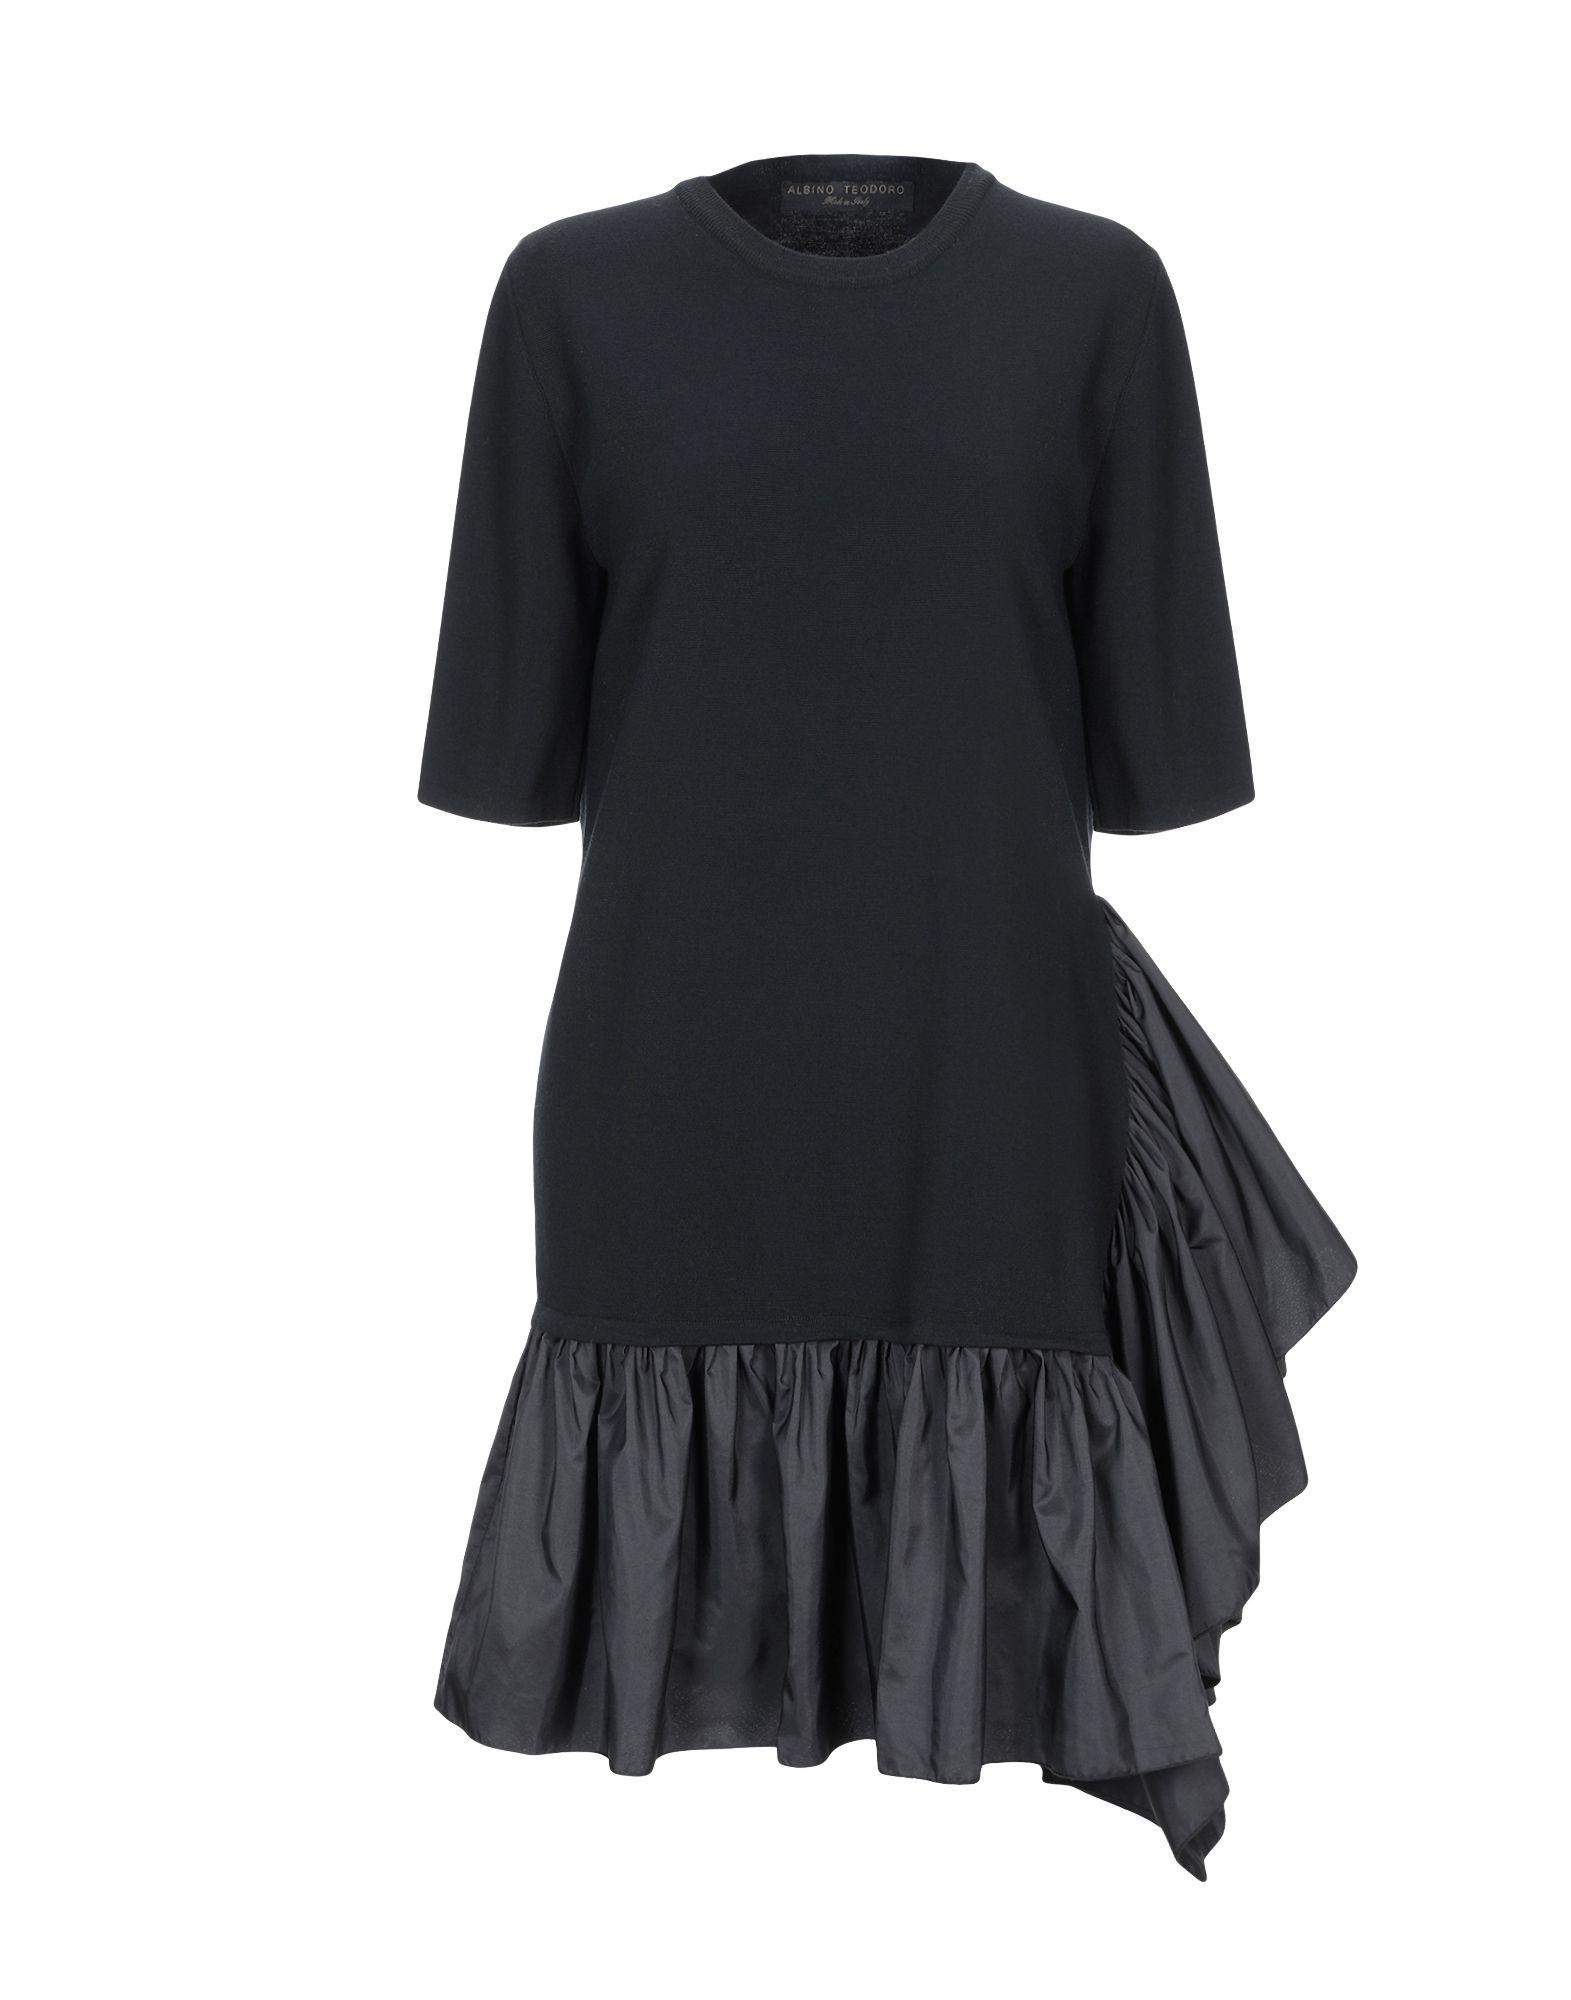 ALBINO TEODORO Короткое платье стоимость